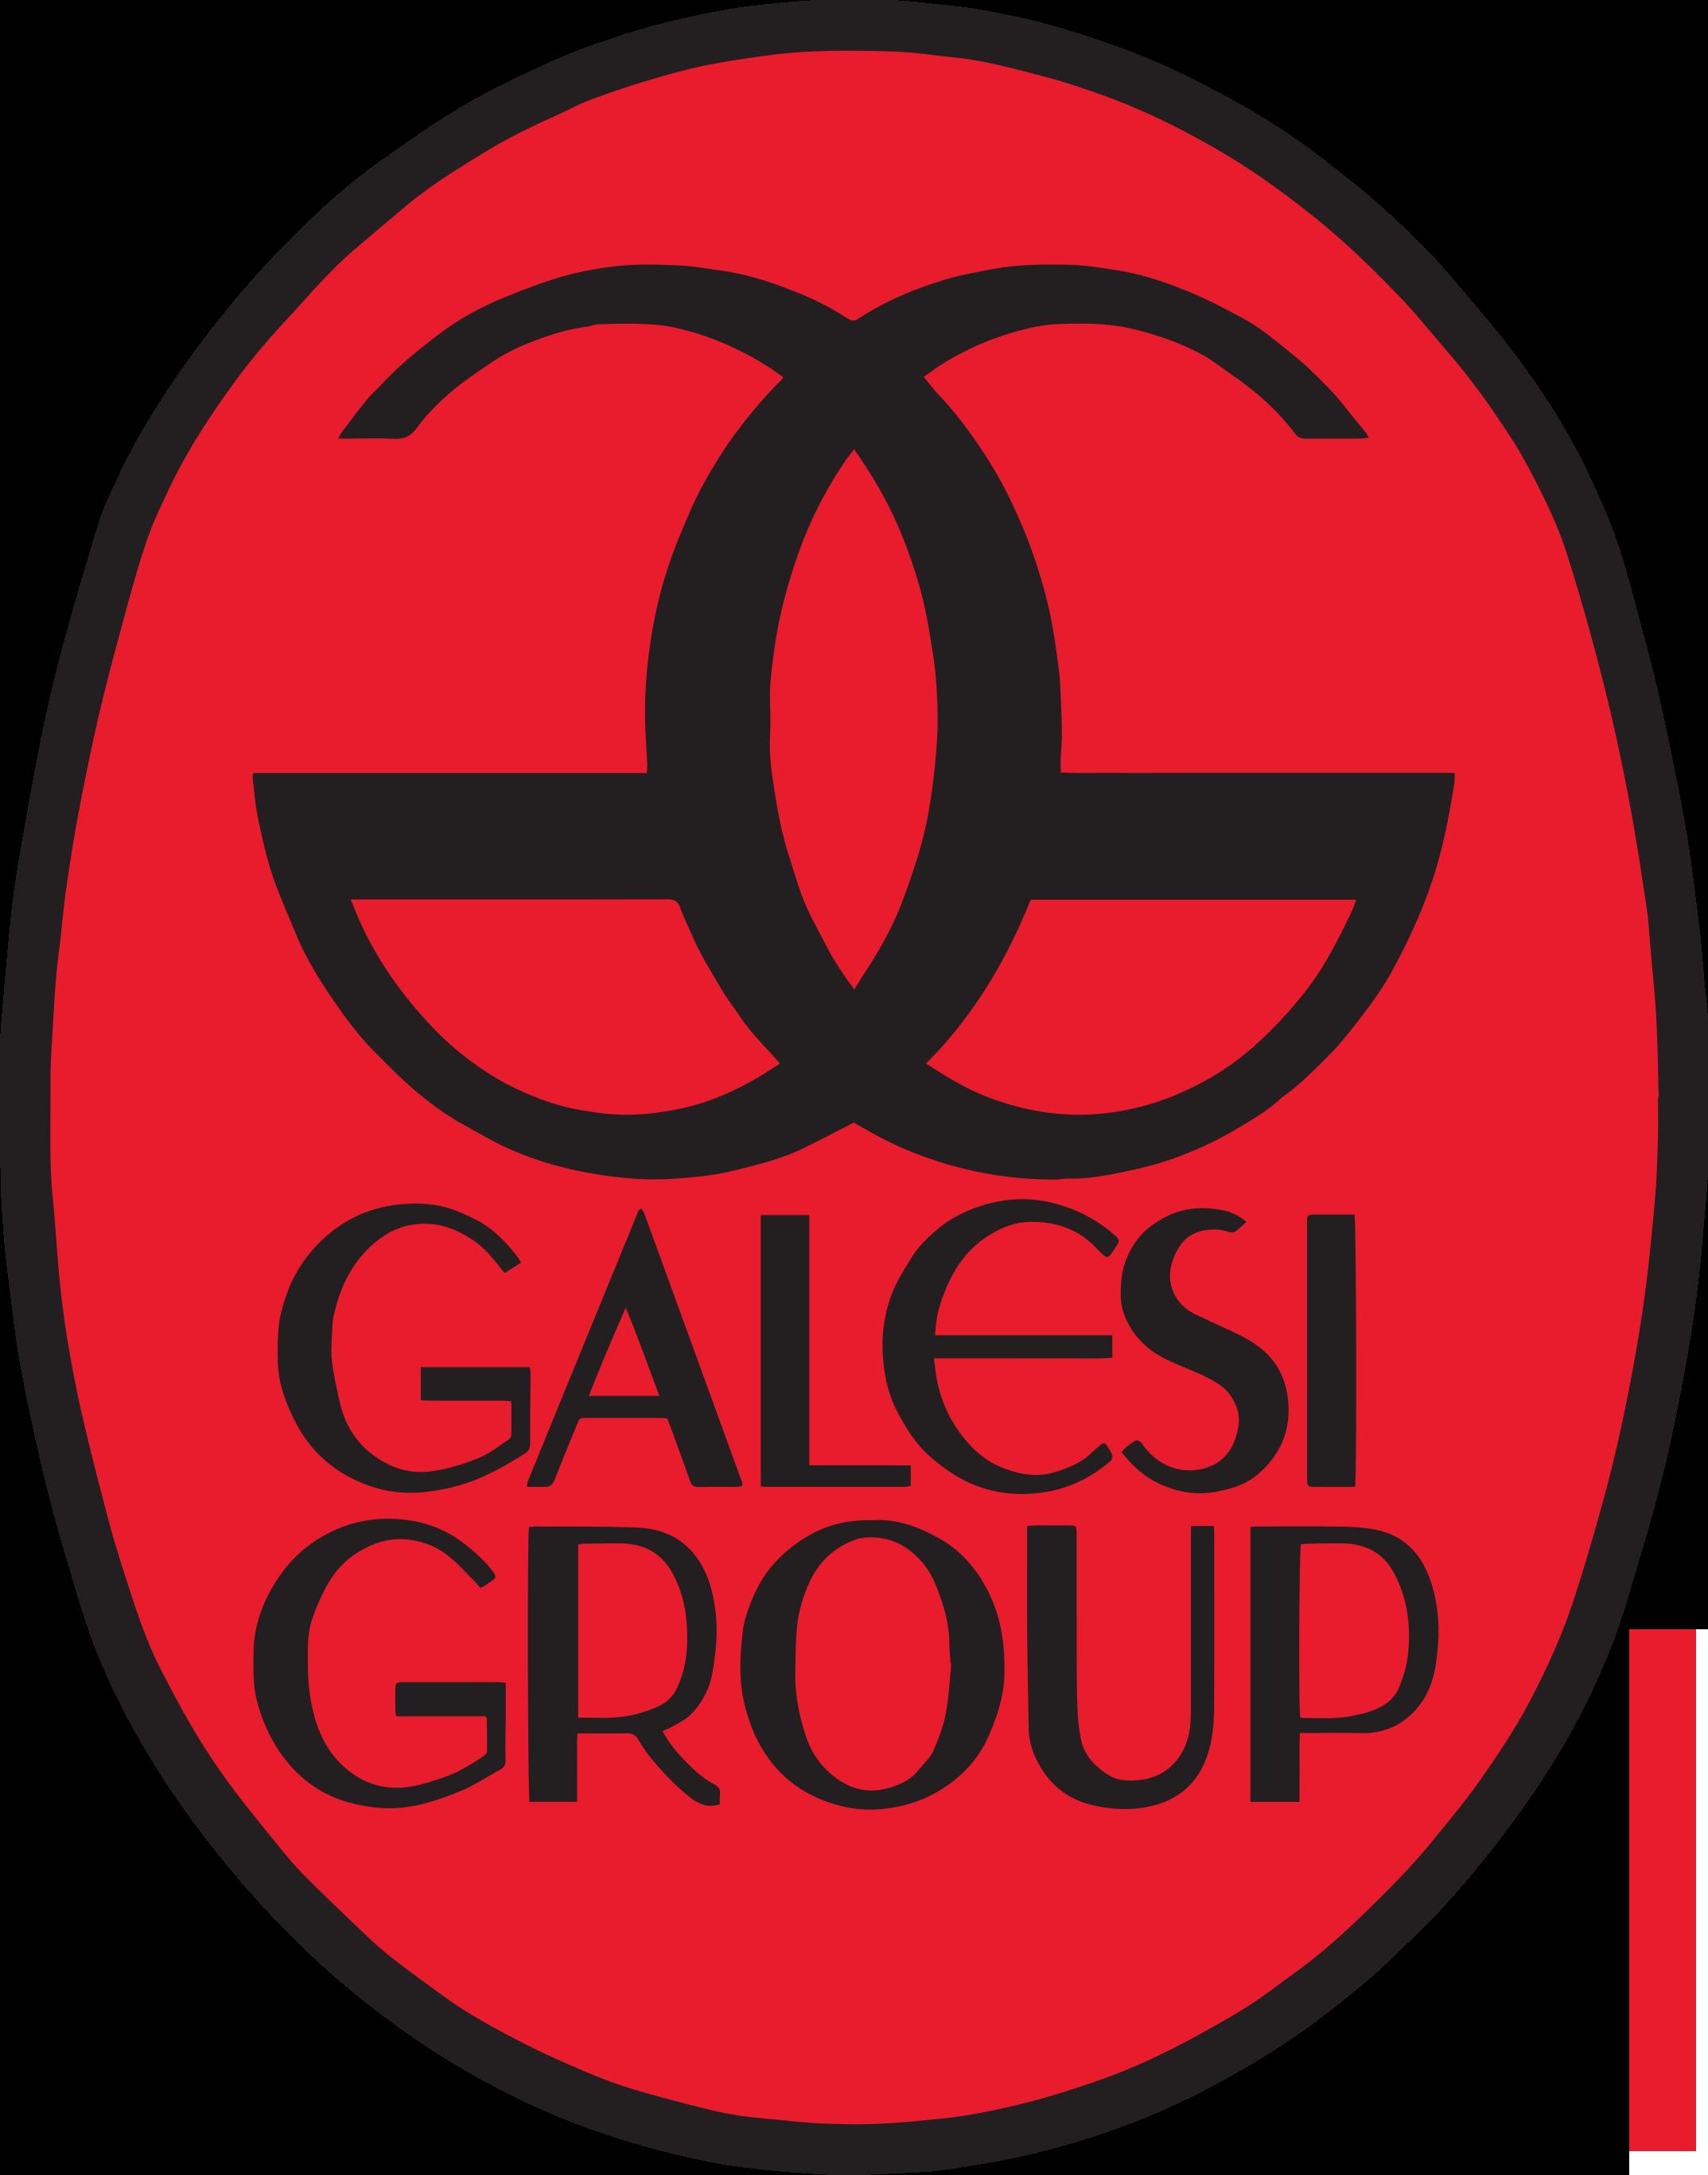 galessi logo